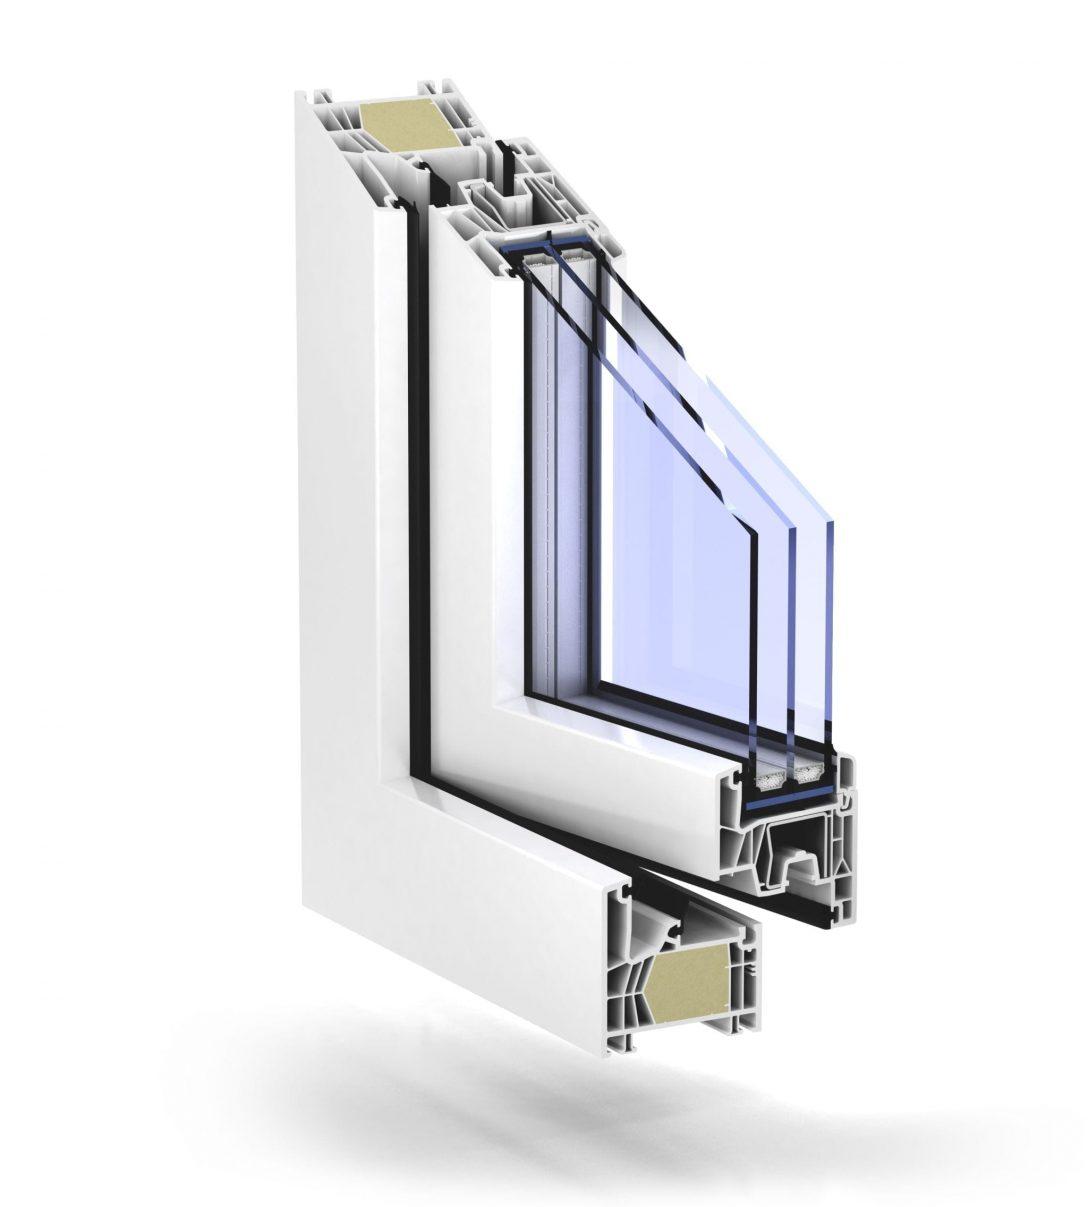 Large Size of Trocal Fenster Haustrsysteme Produkte De Aco Türen Gardinen Plissee Rollos Veka Schüco Preise Sonnenschutzfolie Fenster Trocal Fenster